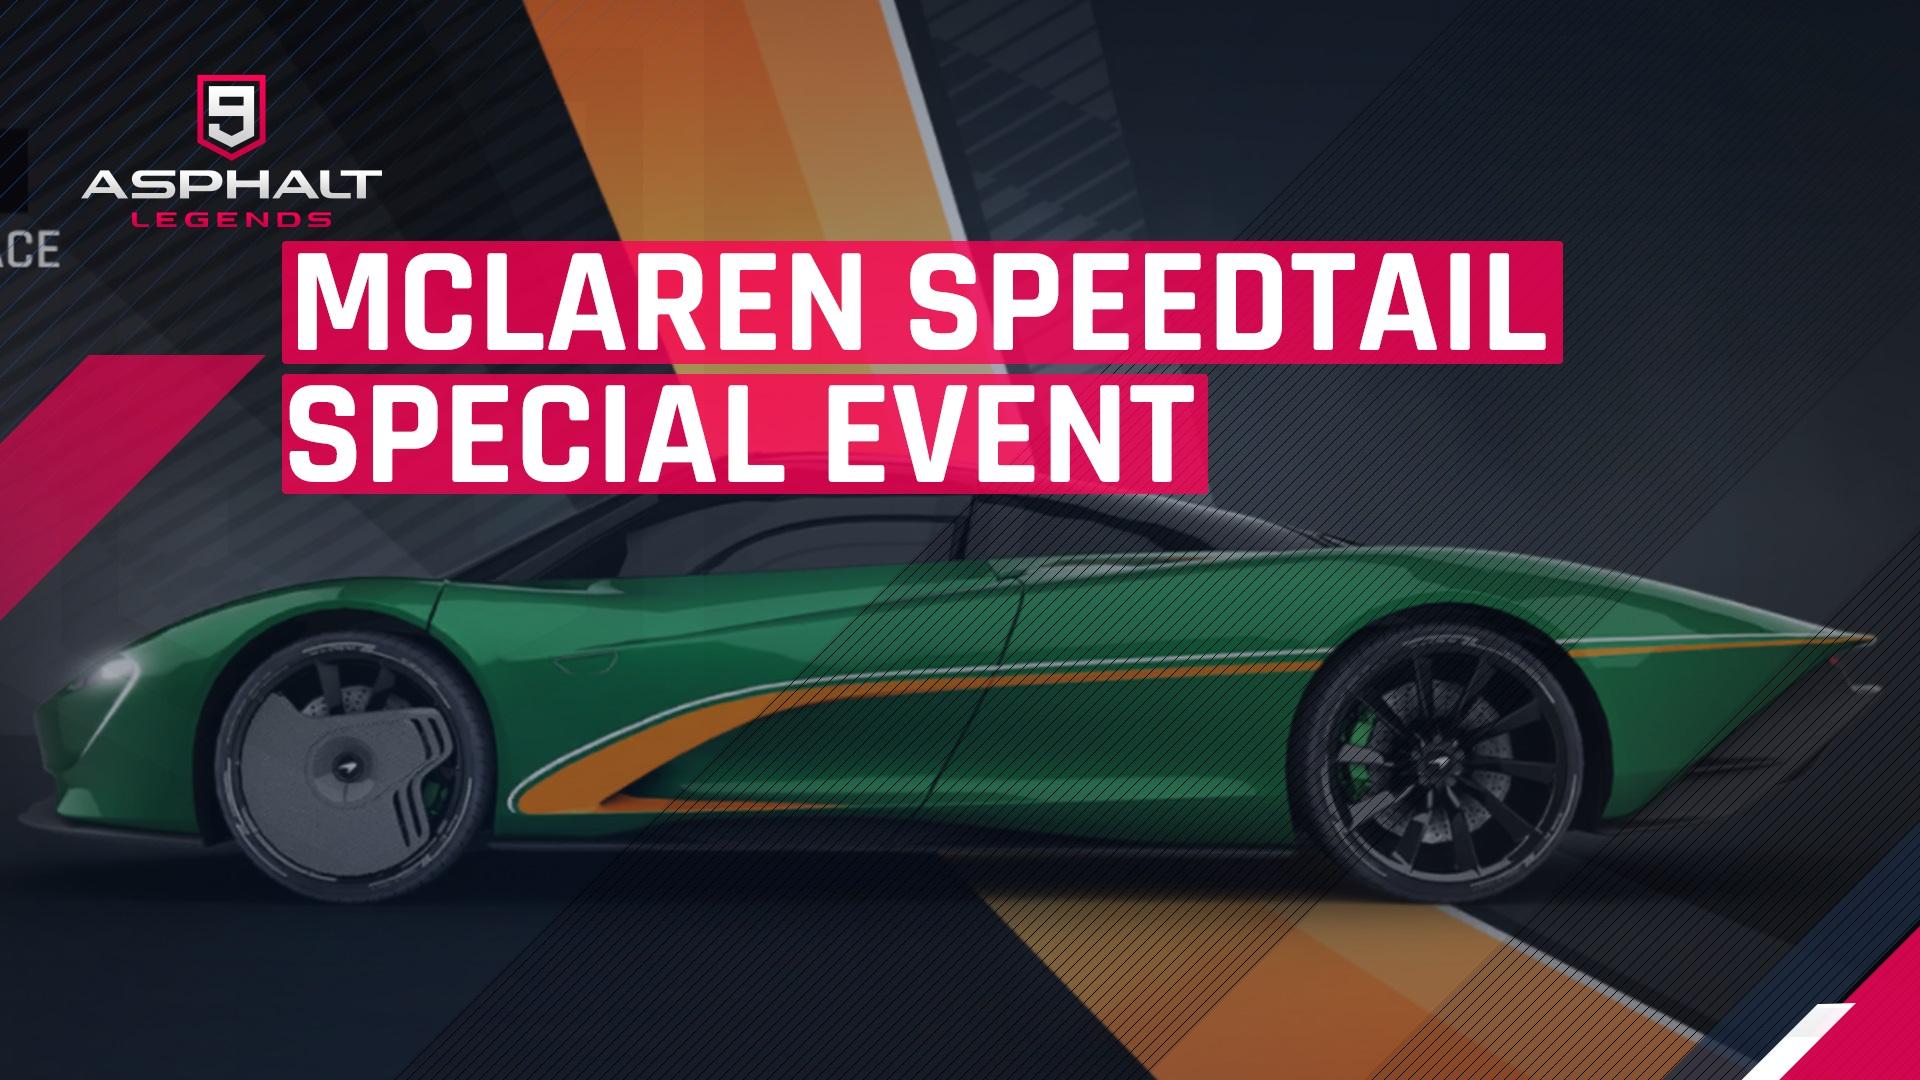 Asphalt 9 McLaren Speedtail Special Event